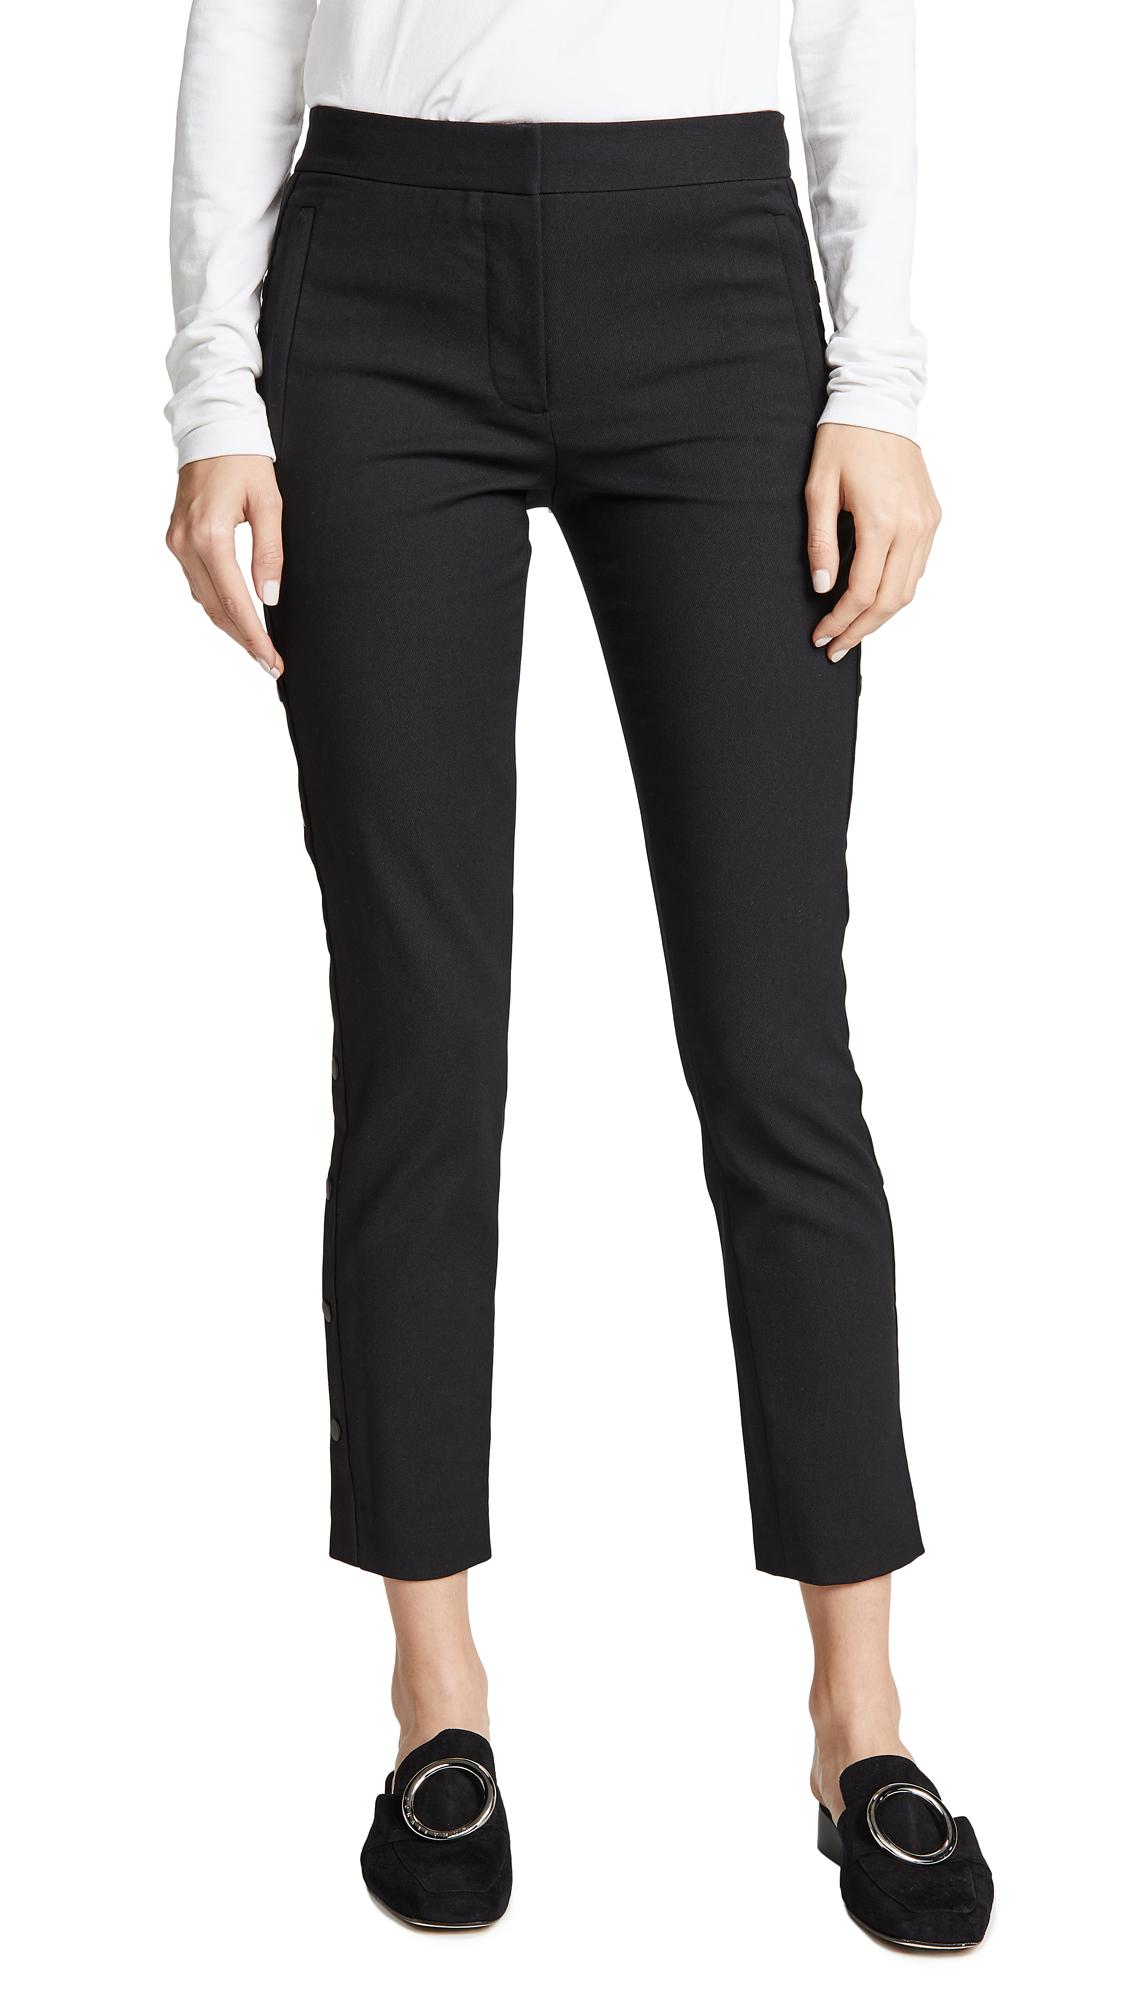 Tibi Cropped Skinny Pants - Black